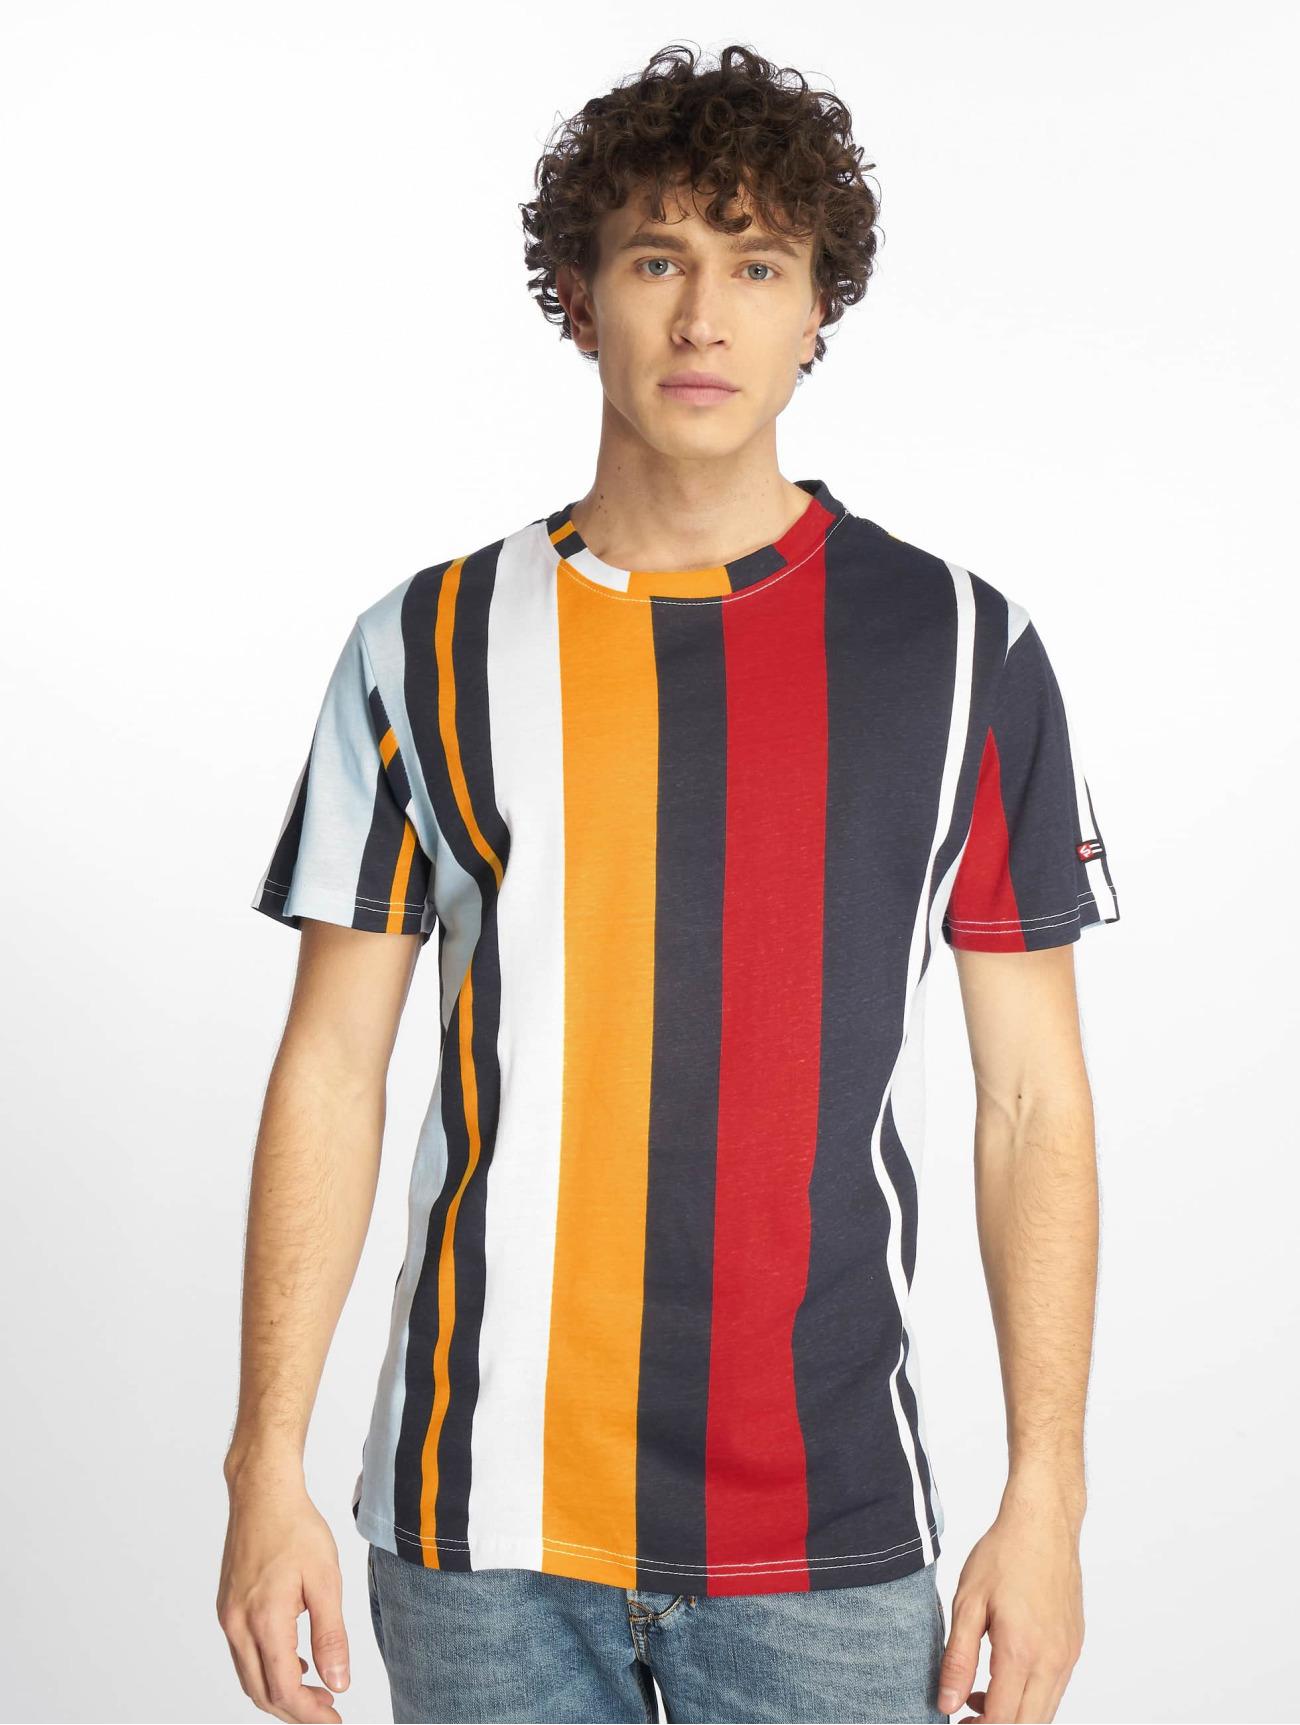 Southpole Överdel / T-shirt Vertical Stripe Print  i blå 644457 Män Överdelar